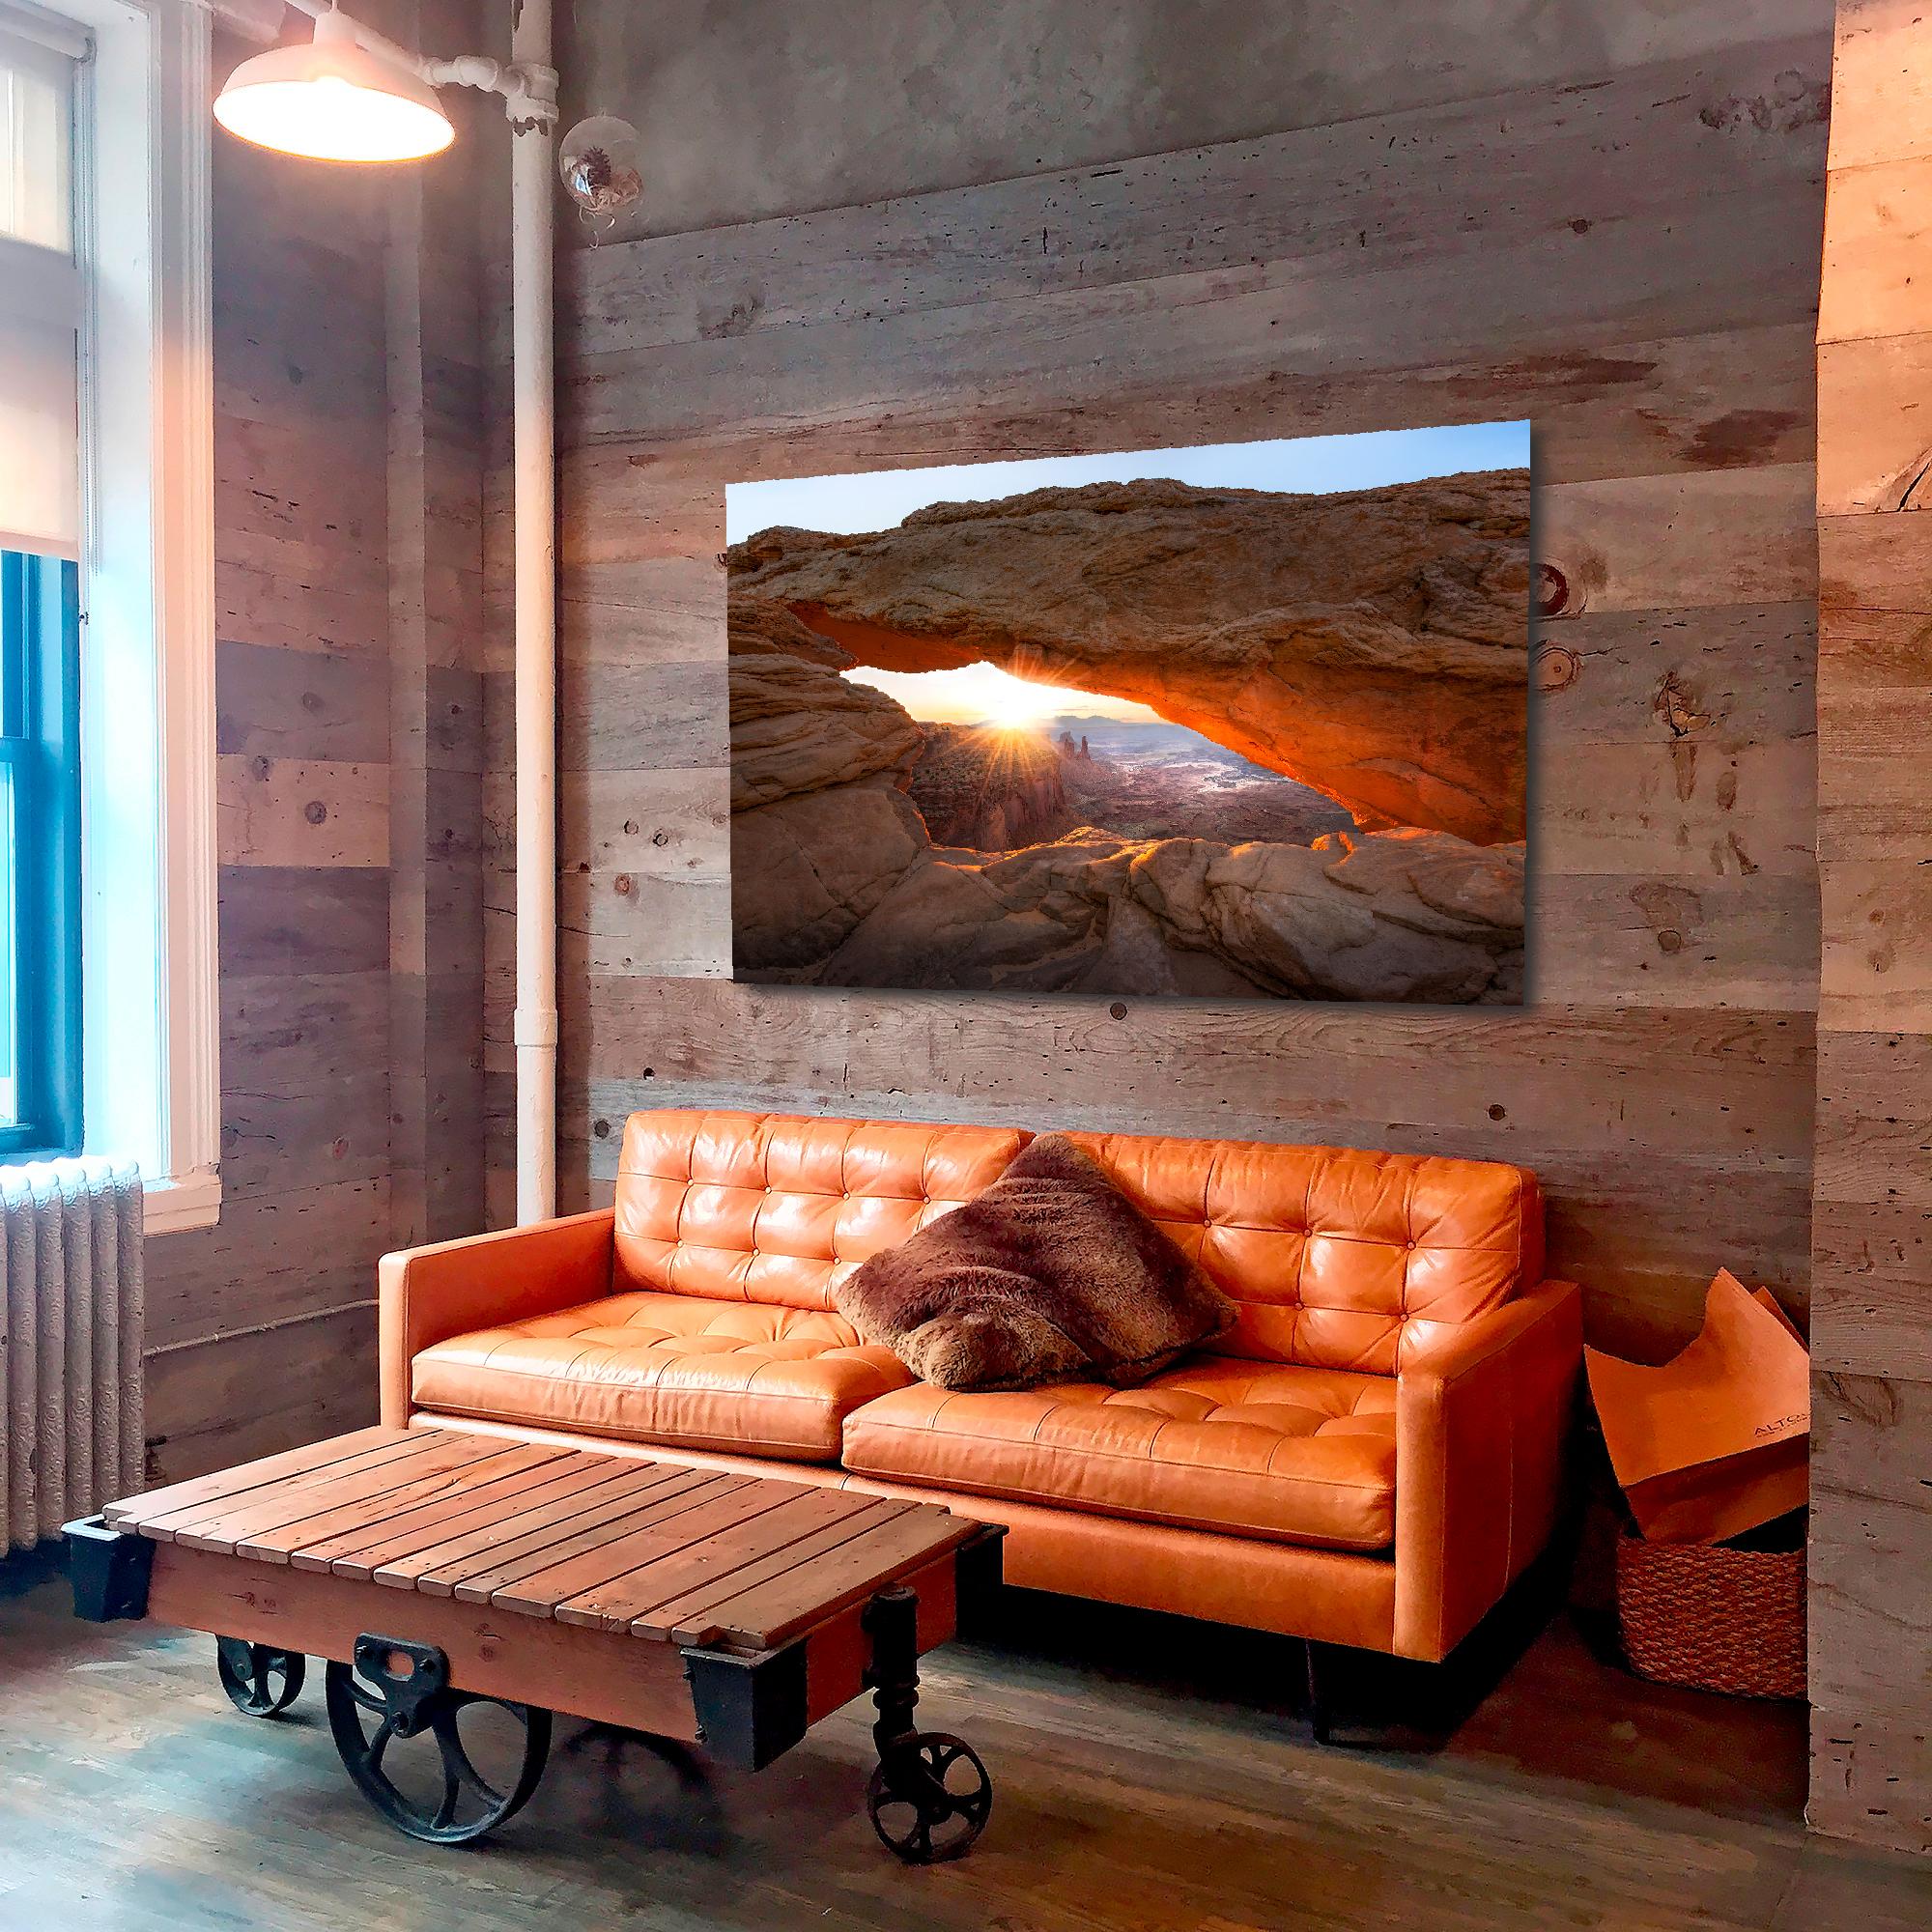 woodsy interior.jpg